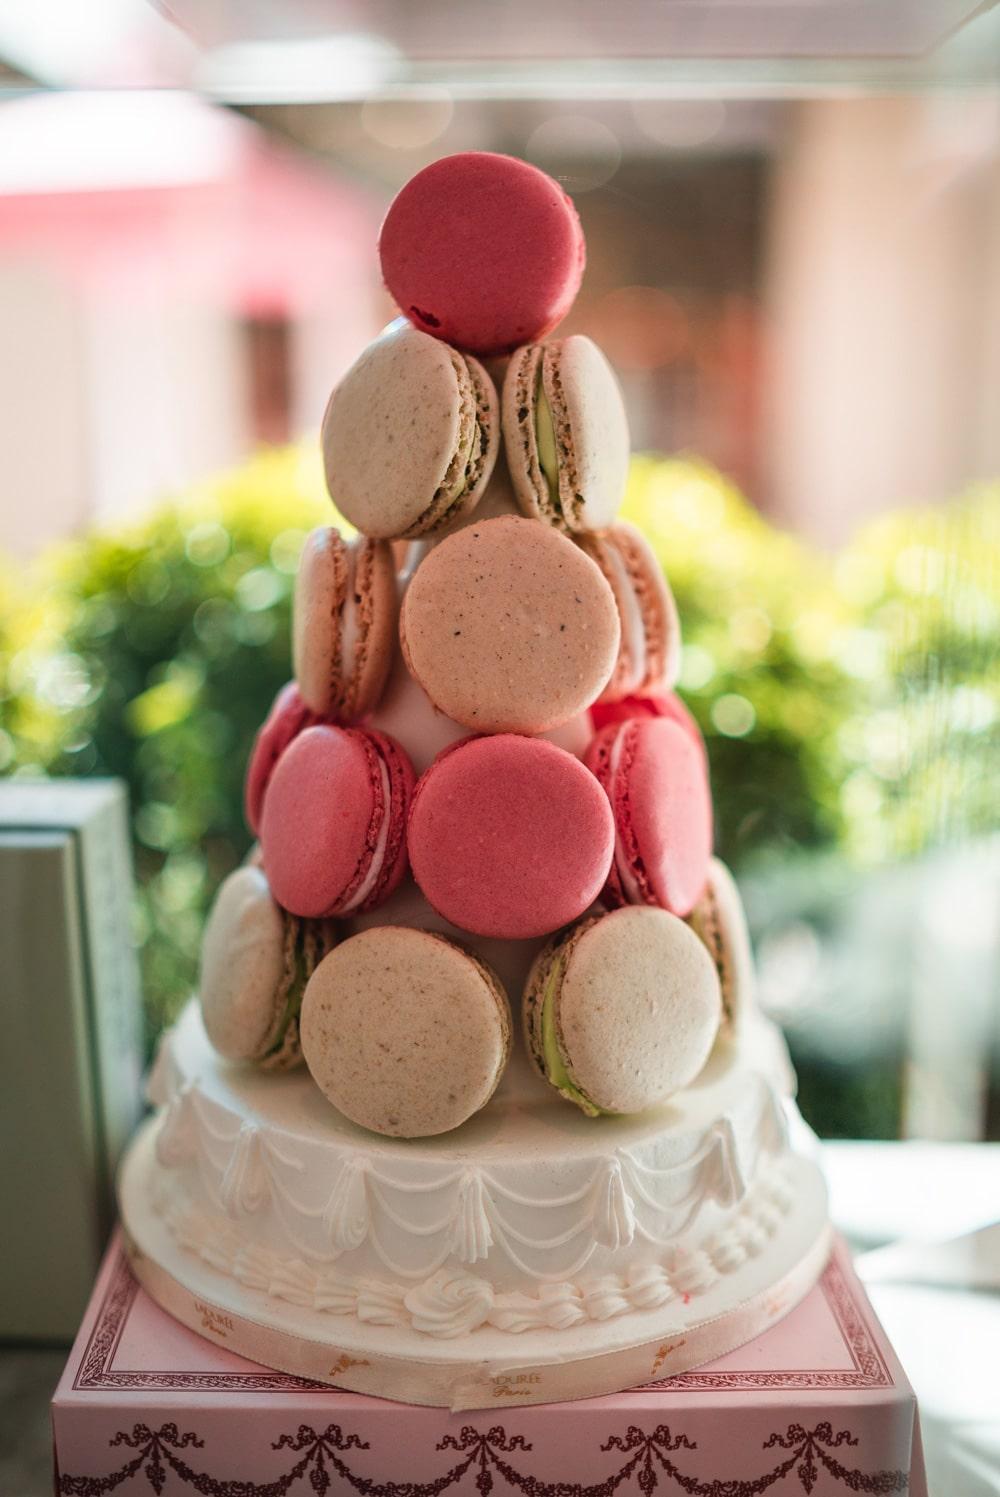 Macarons von Ladurée, Foto: Andreas Dress / Unsplash